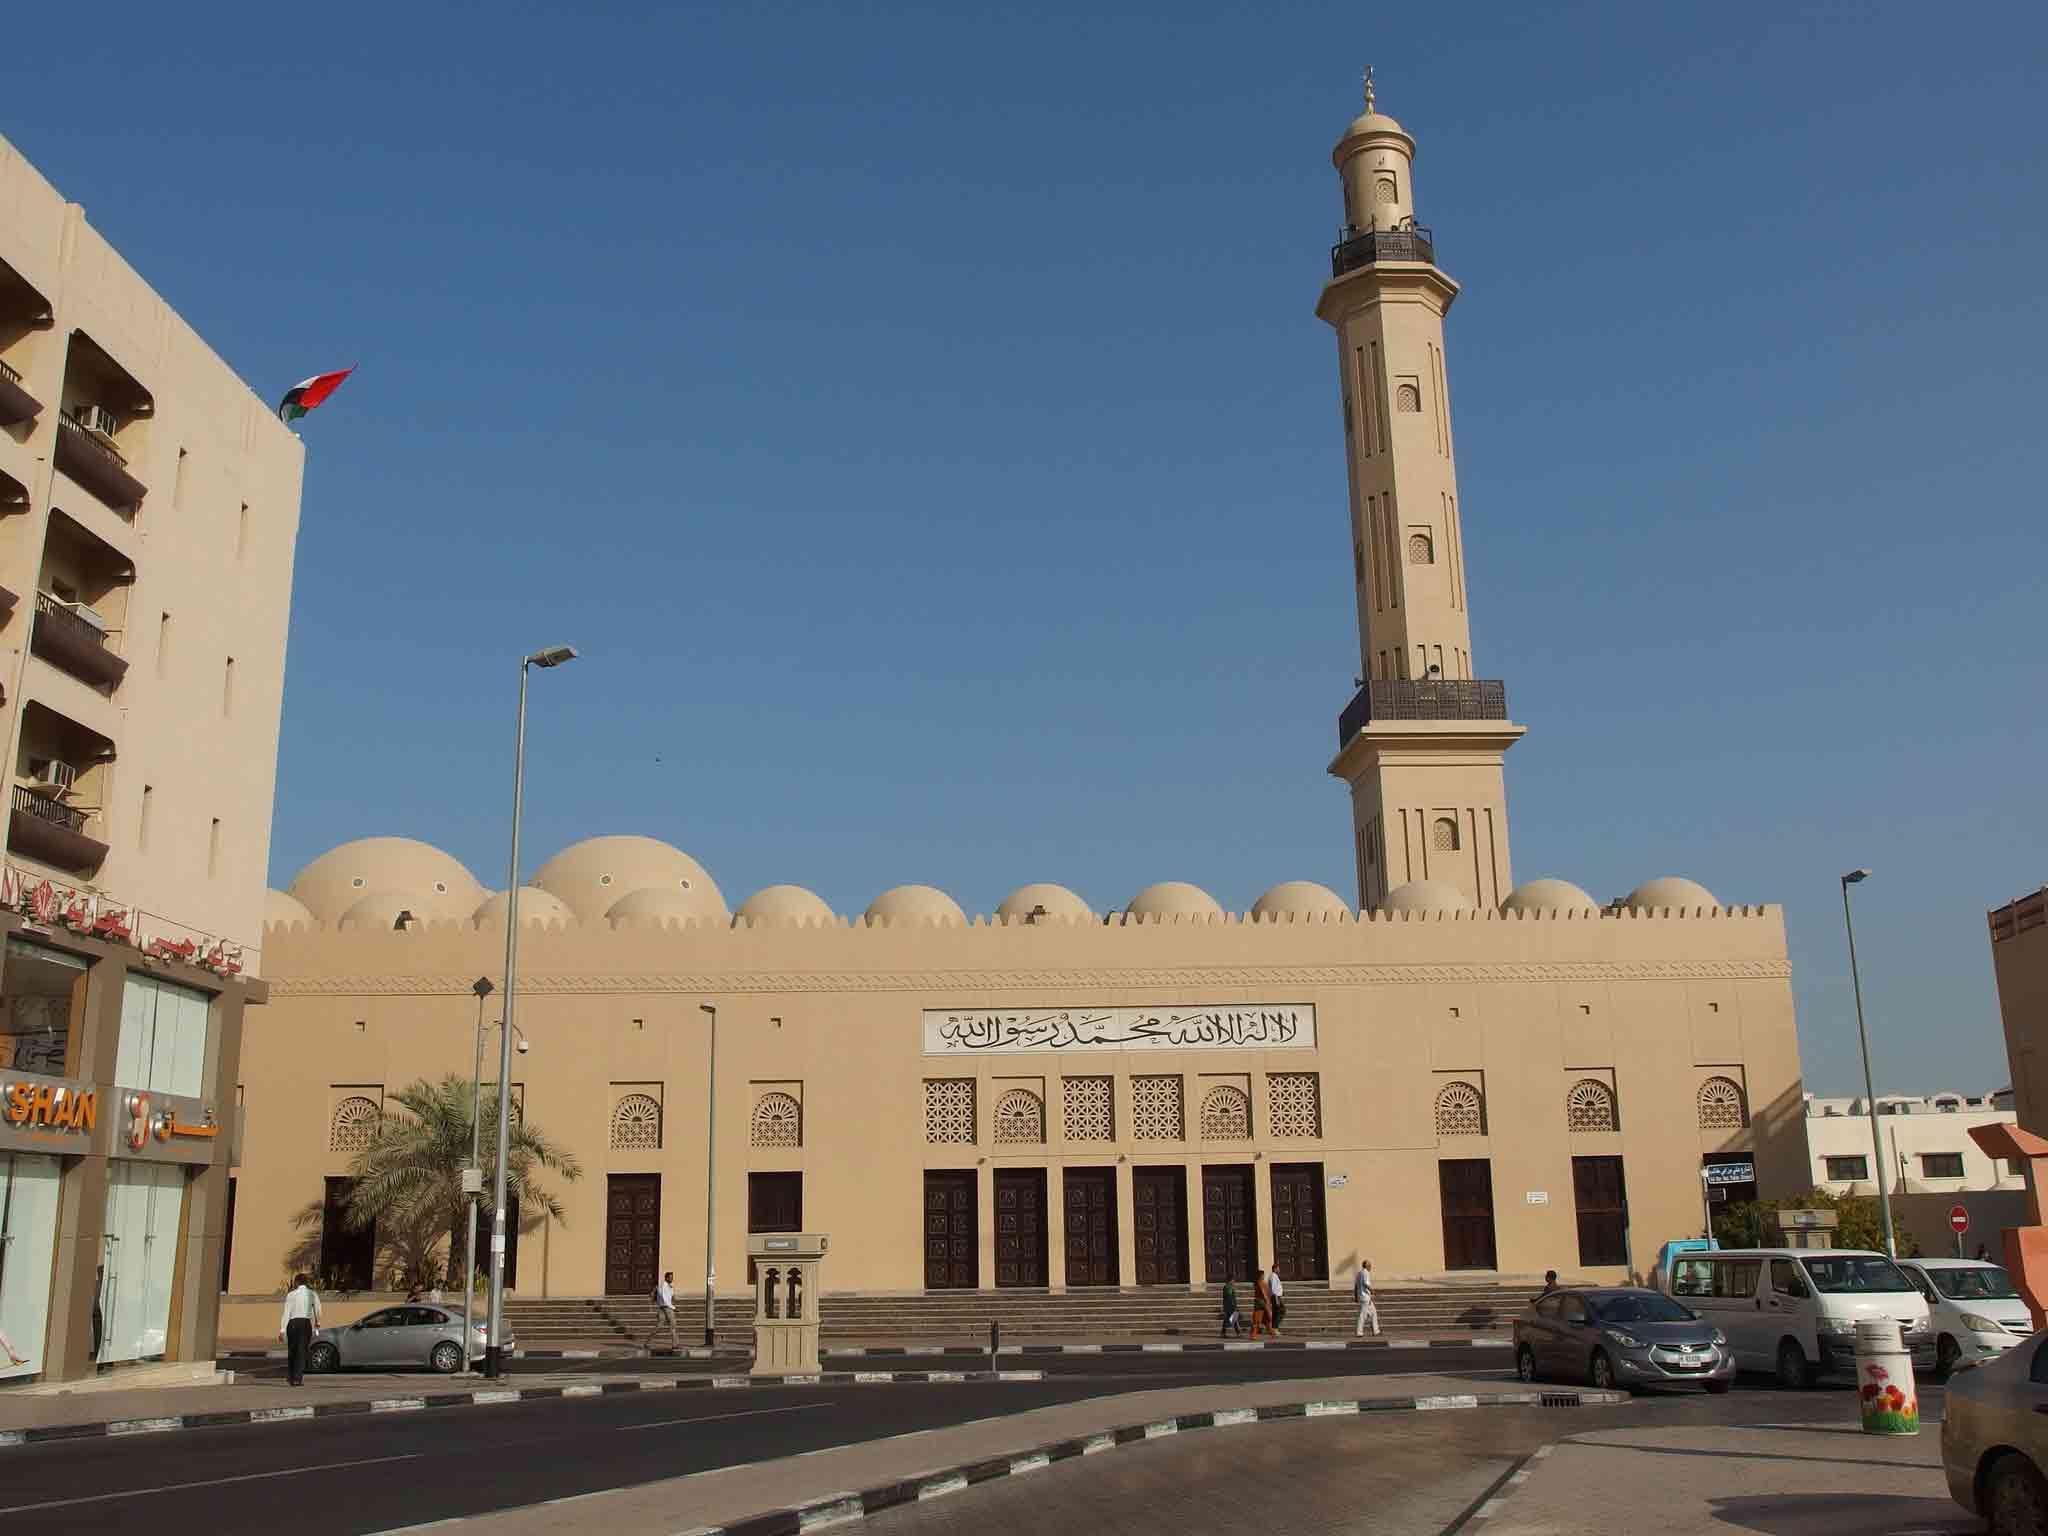 Grand Mosque Dubai is oldest masjid in Dubai